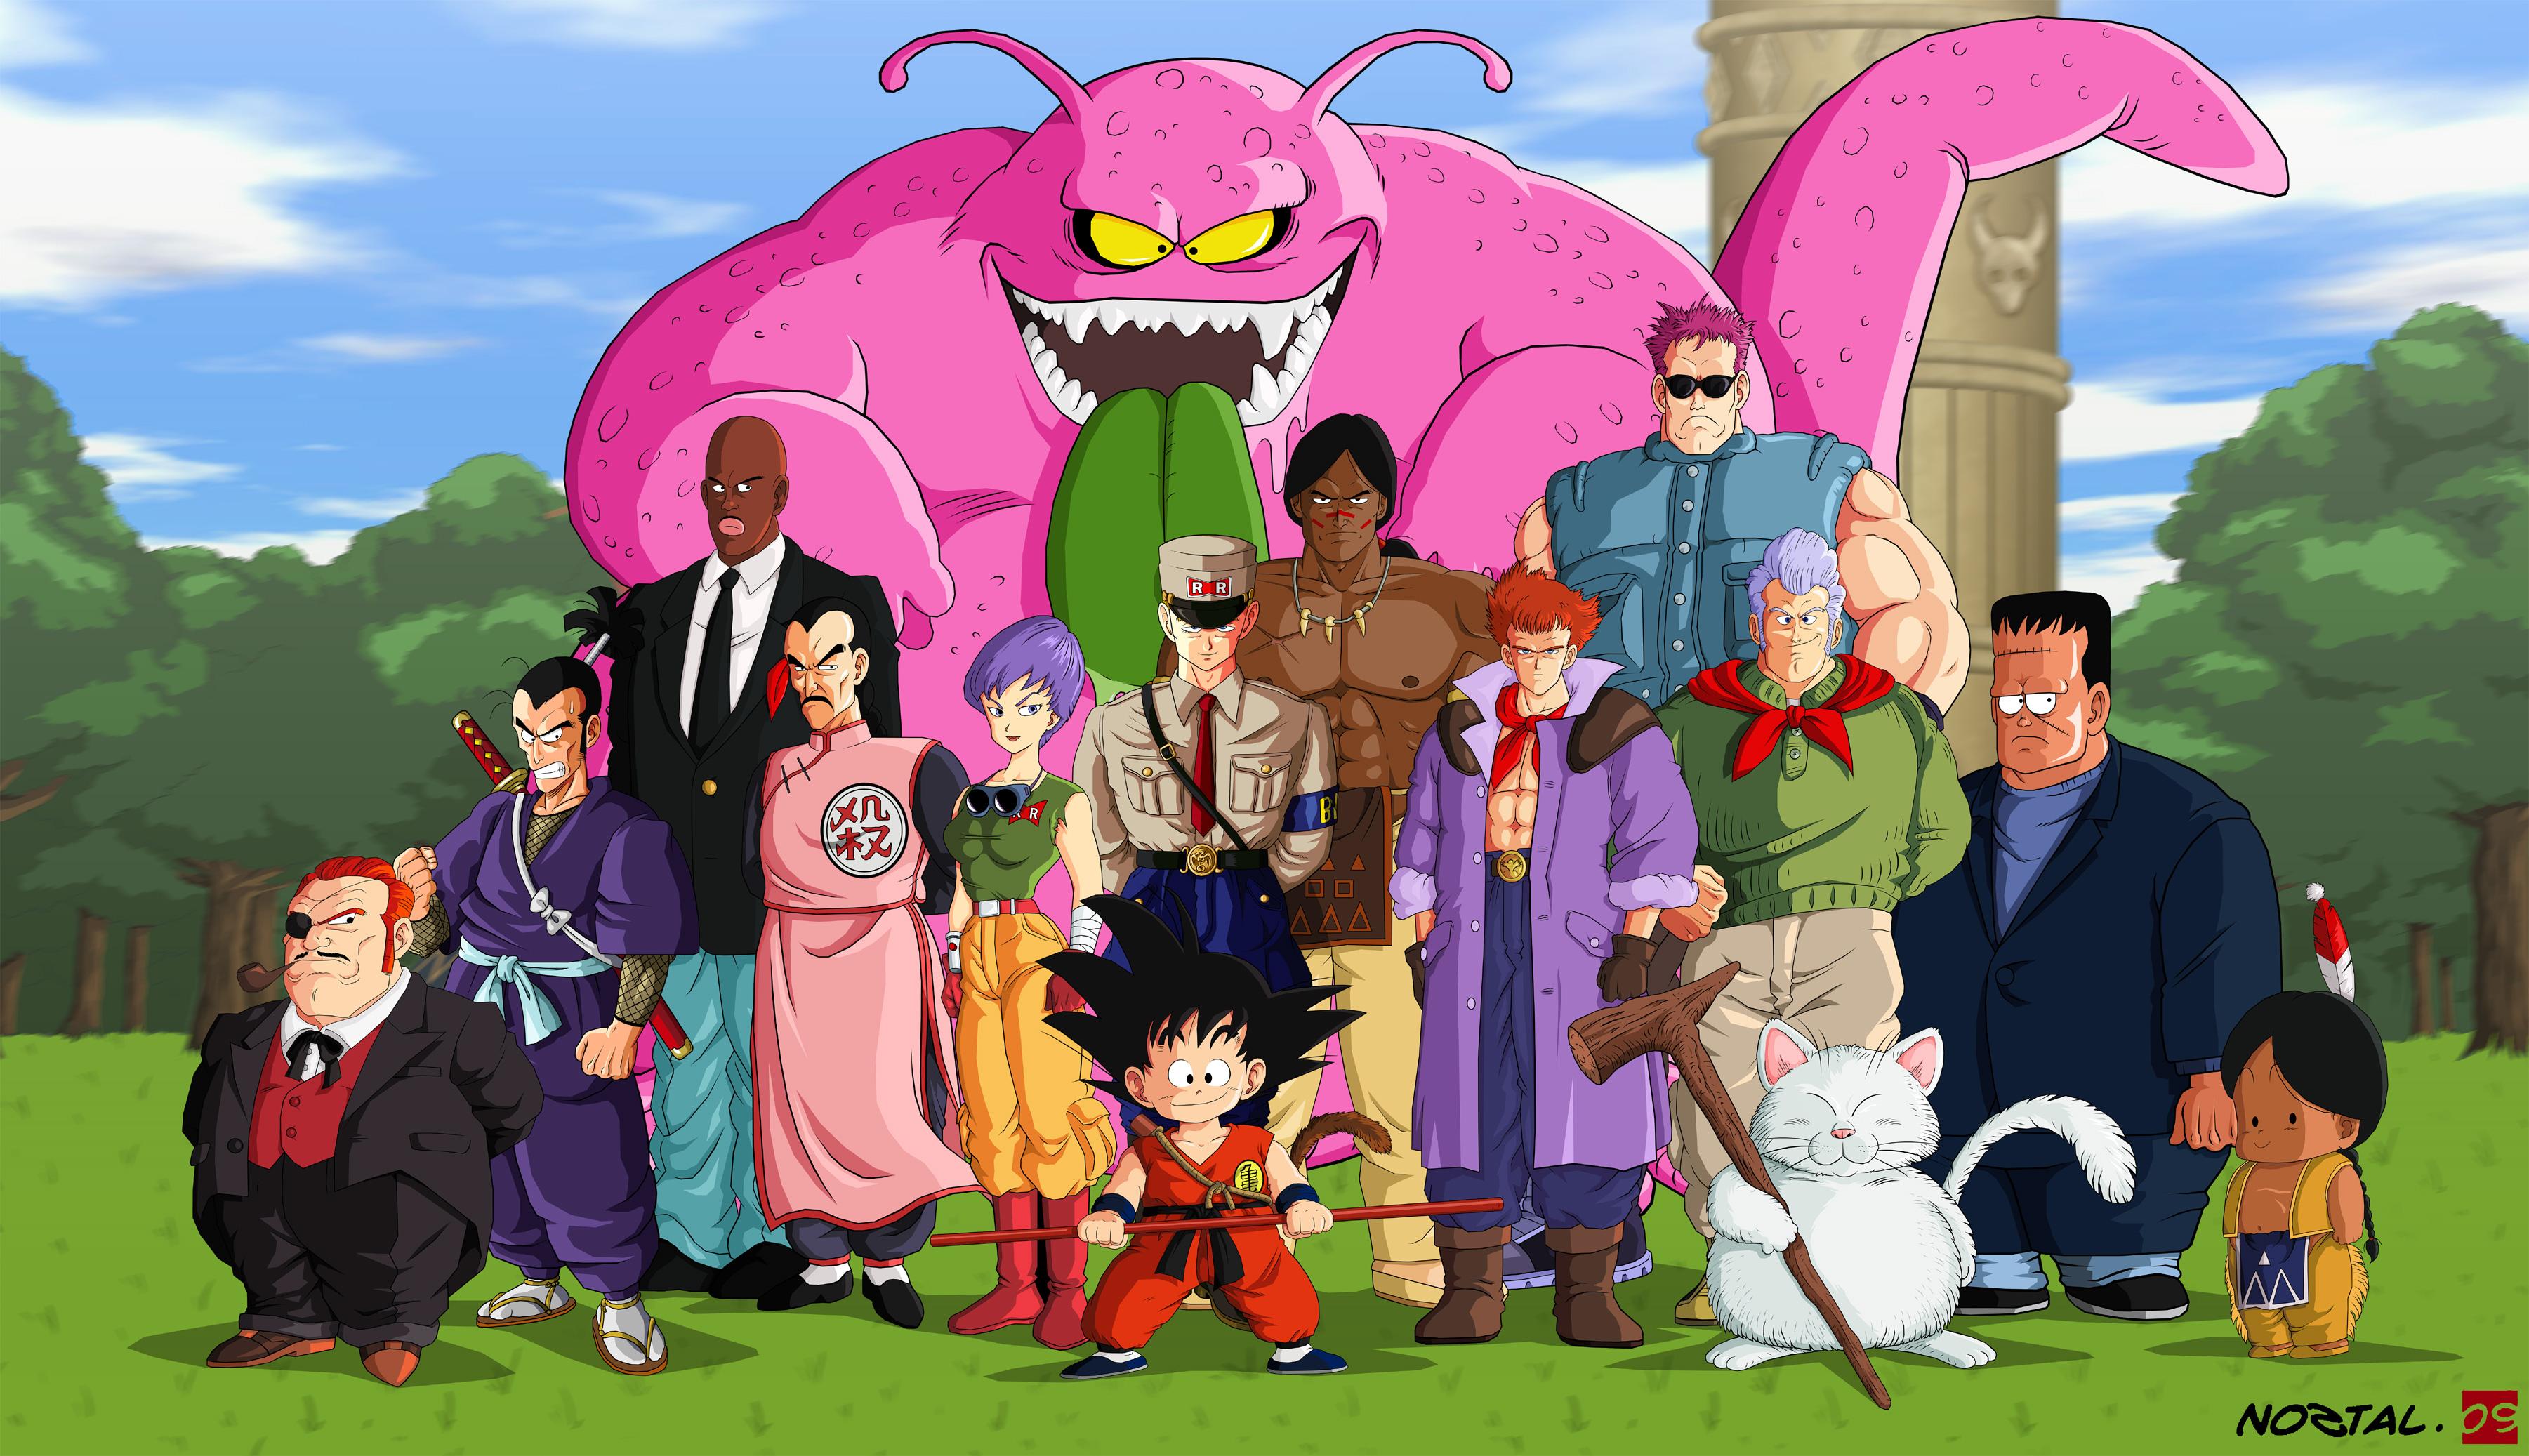 Dragon Ball Z Poster 6 Full HD Fondo De Pantalla And Fondo